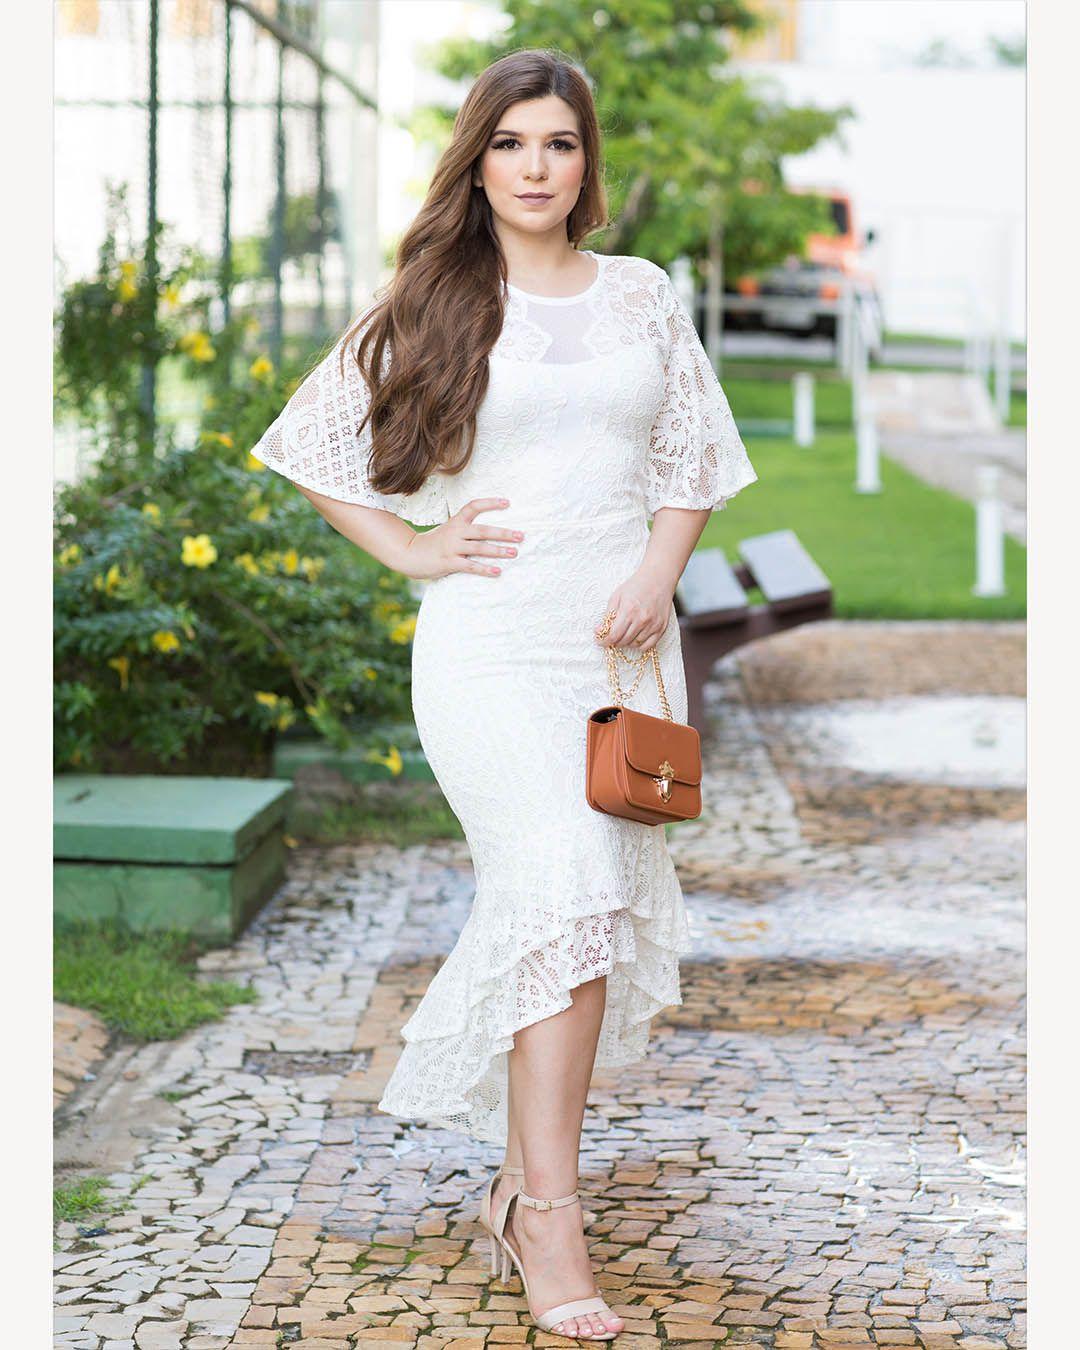 Vestido Branco Midi Mullet em Renda Casamento Civil Az Irmãs